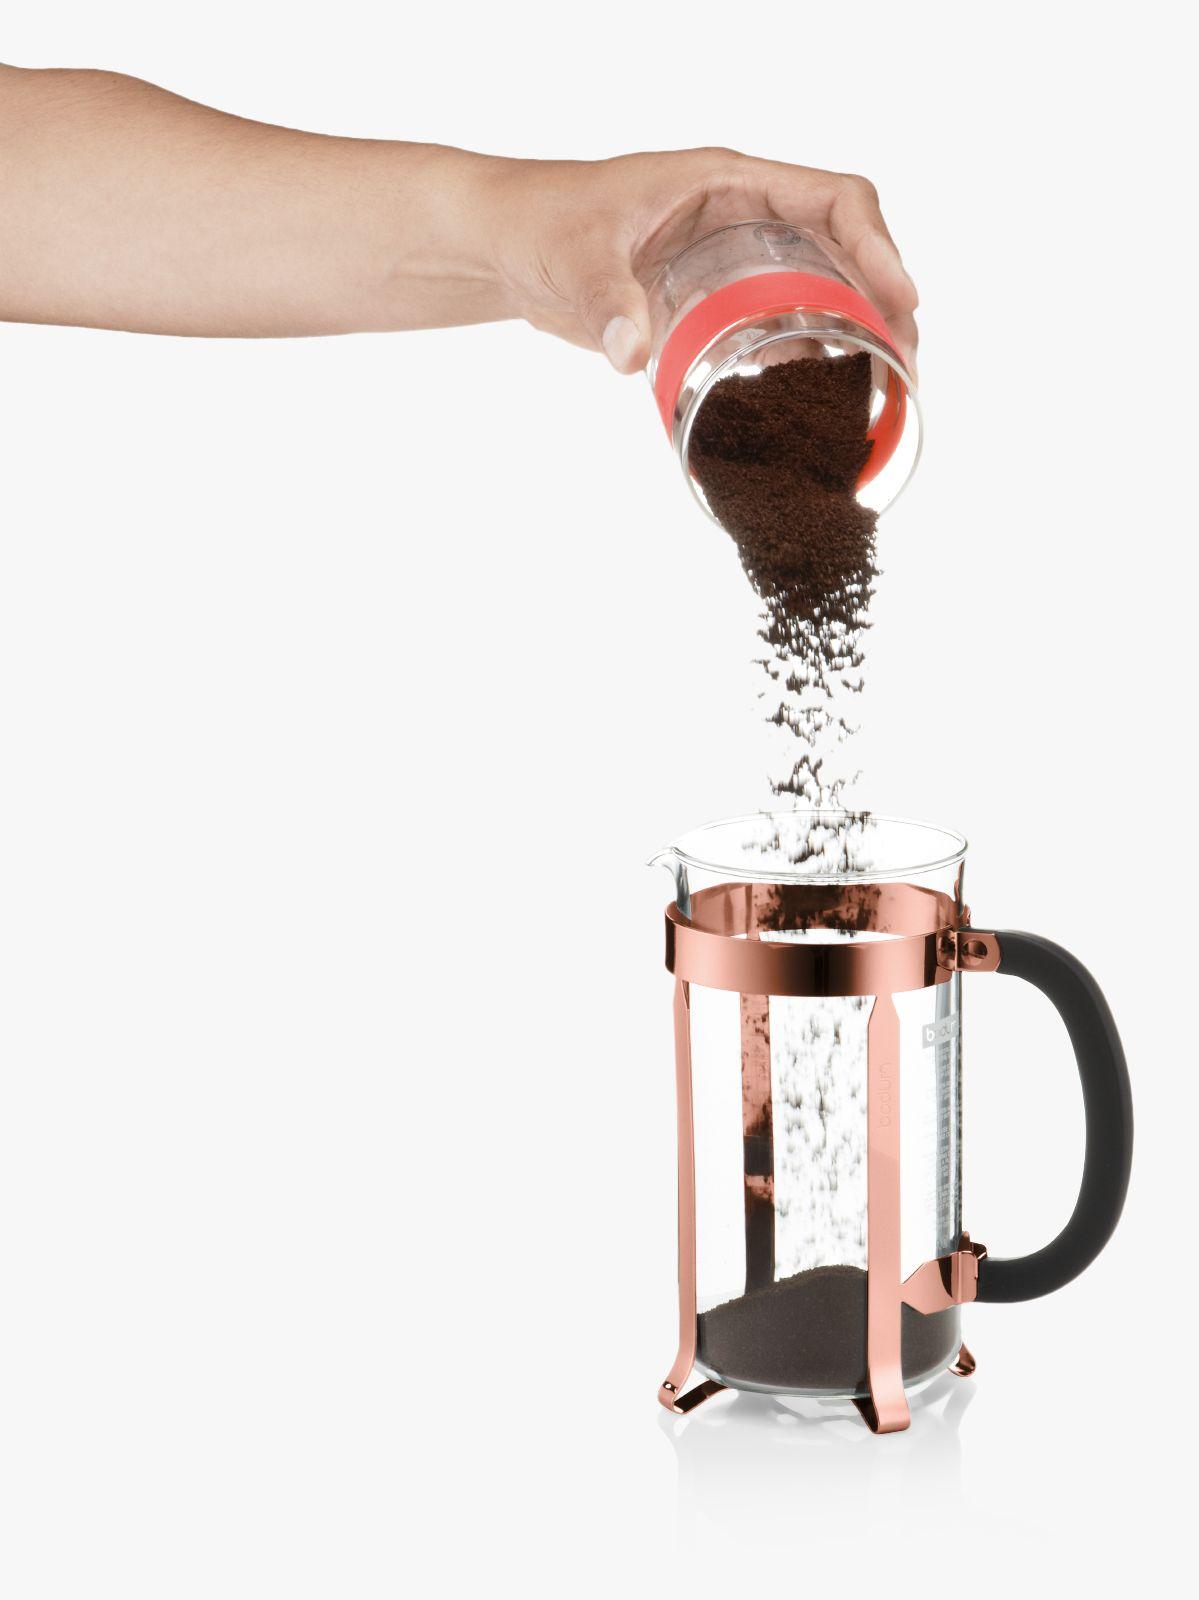 Bodum Bodum Chambord Coffee Maker, 8 Cup, 1L